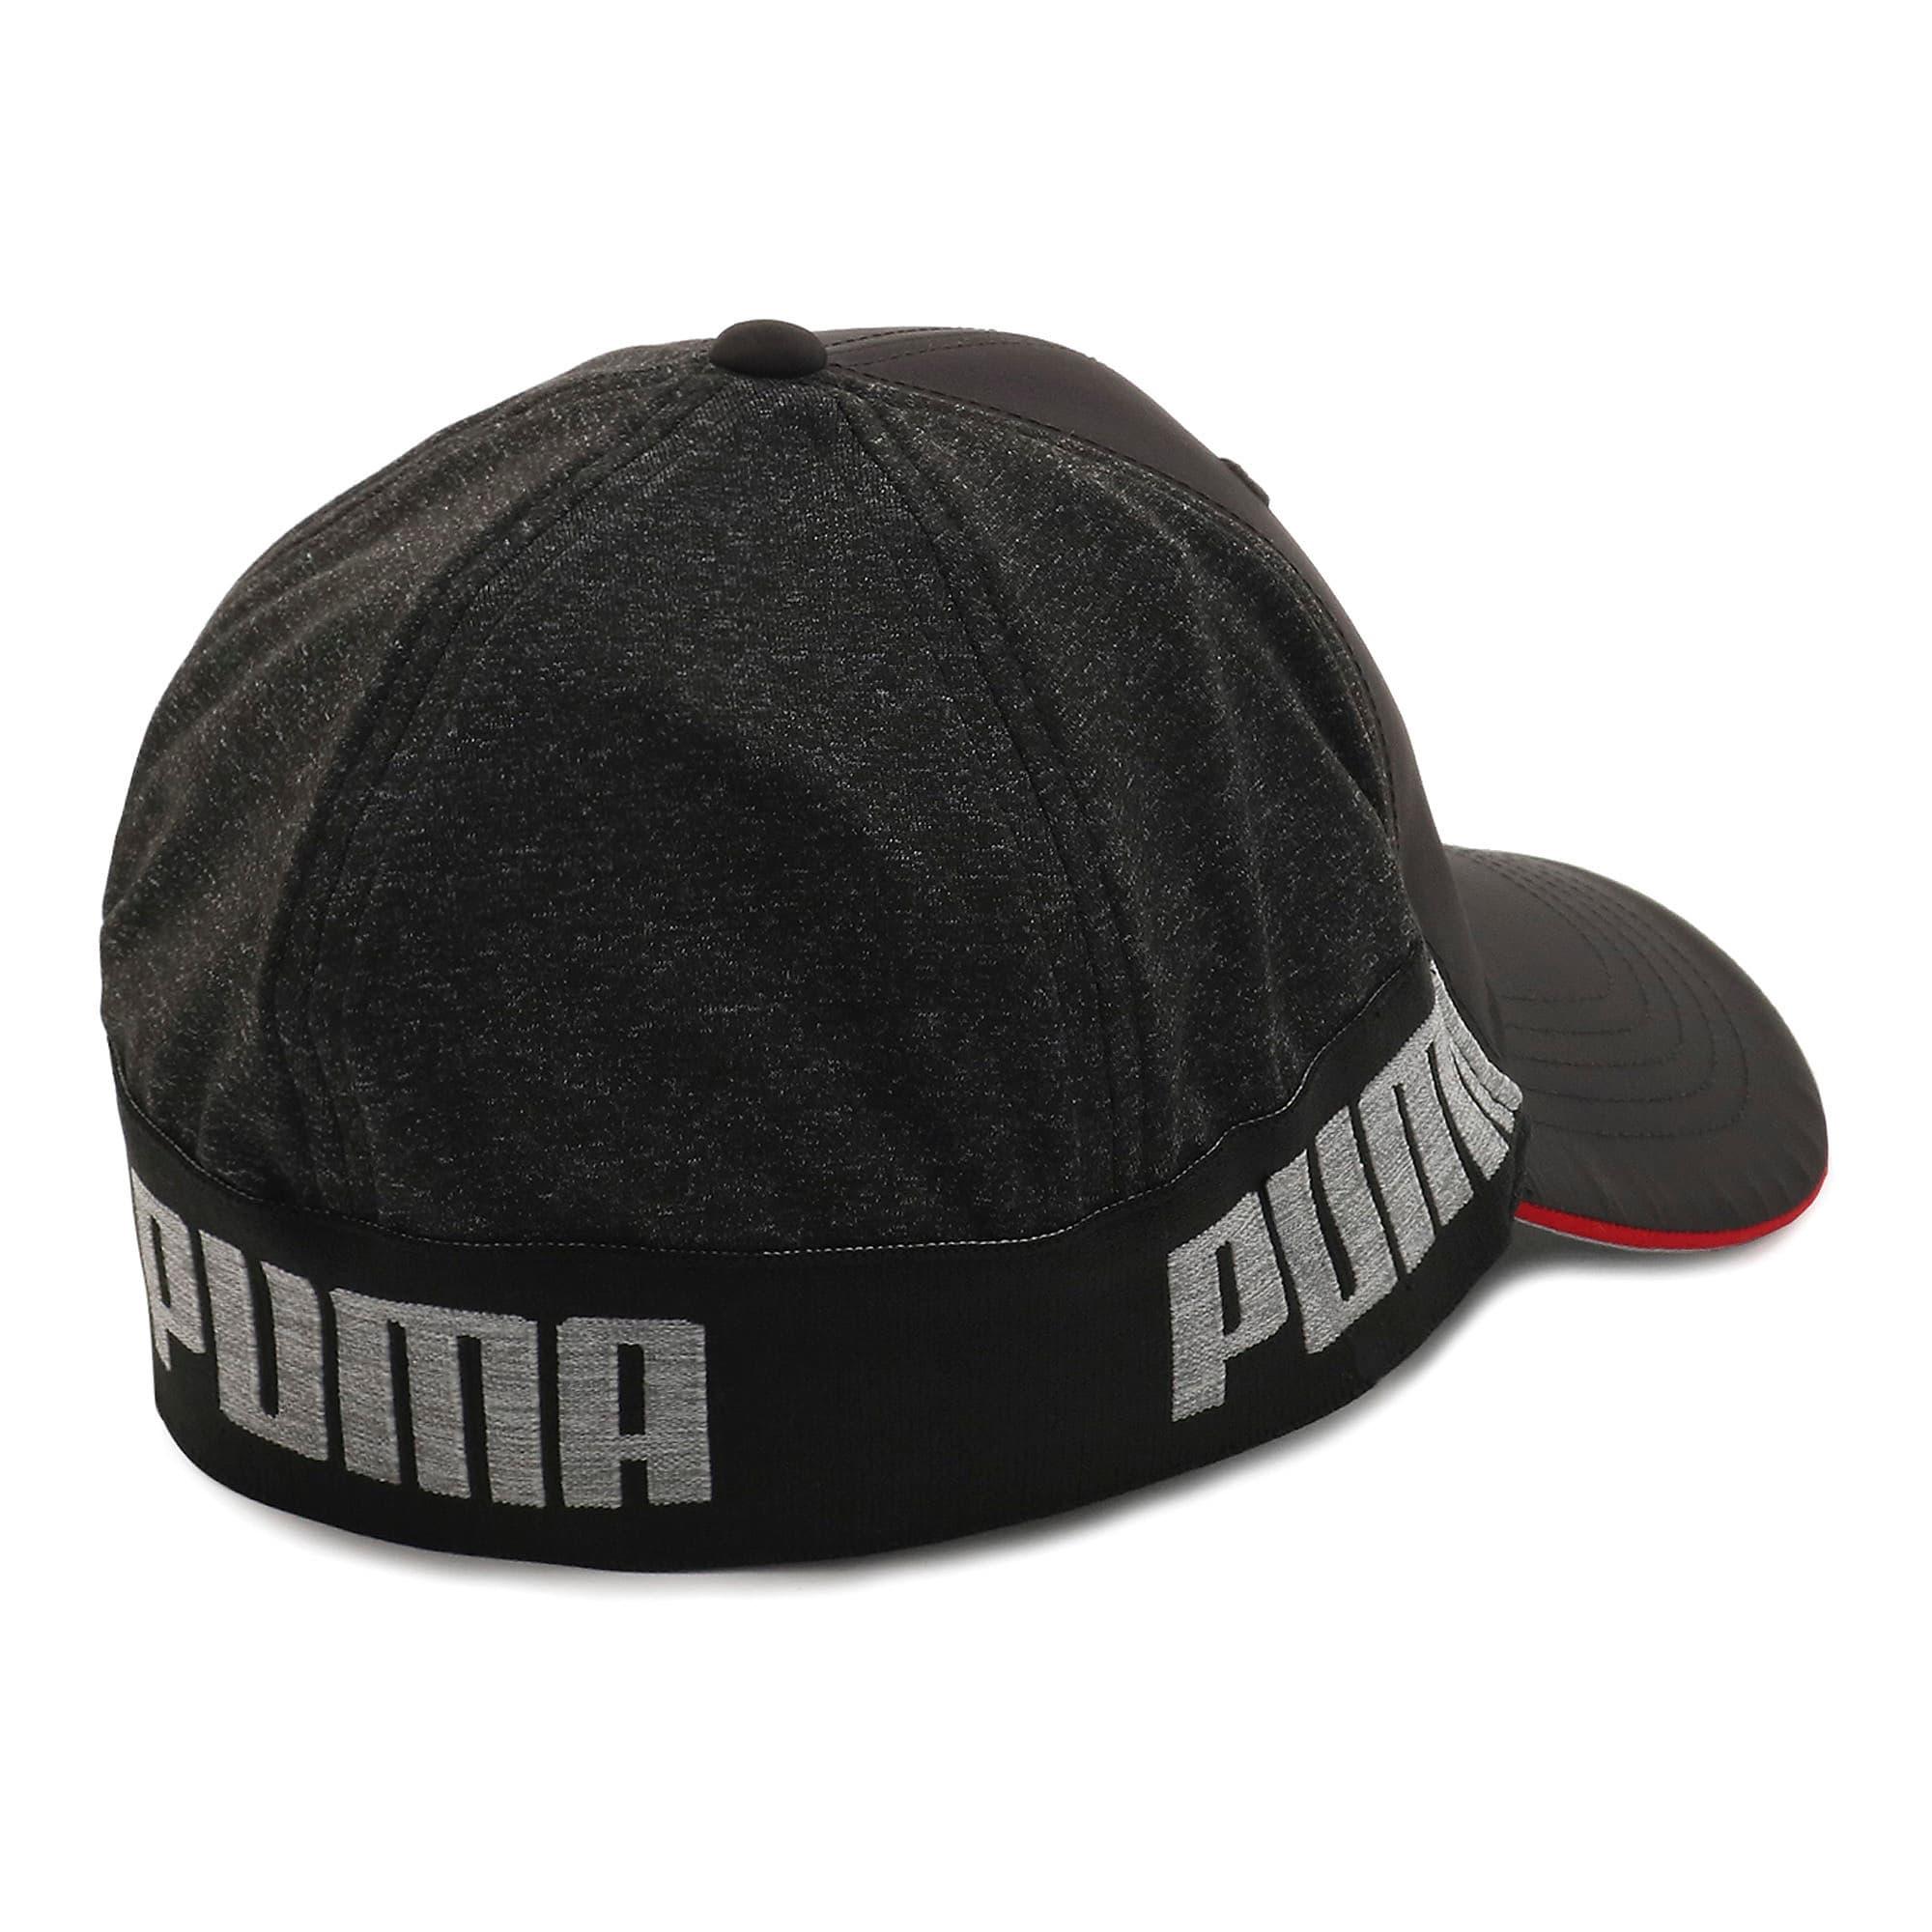 Thumbnail 2 of ゴルフ ストレッチバンド キャップ, Puma Black, medium-JPN